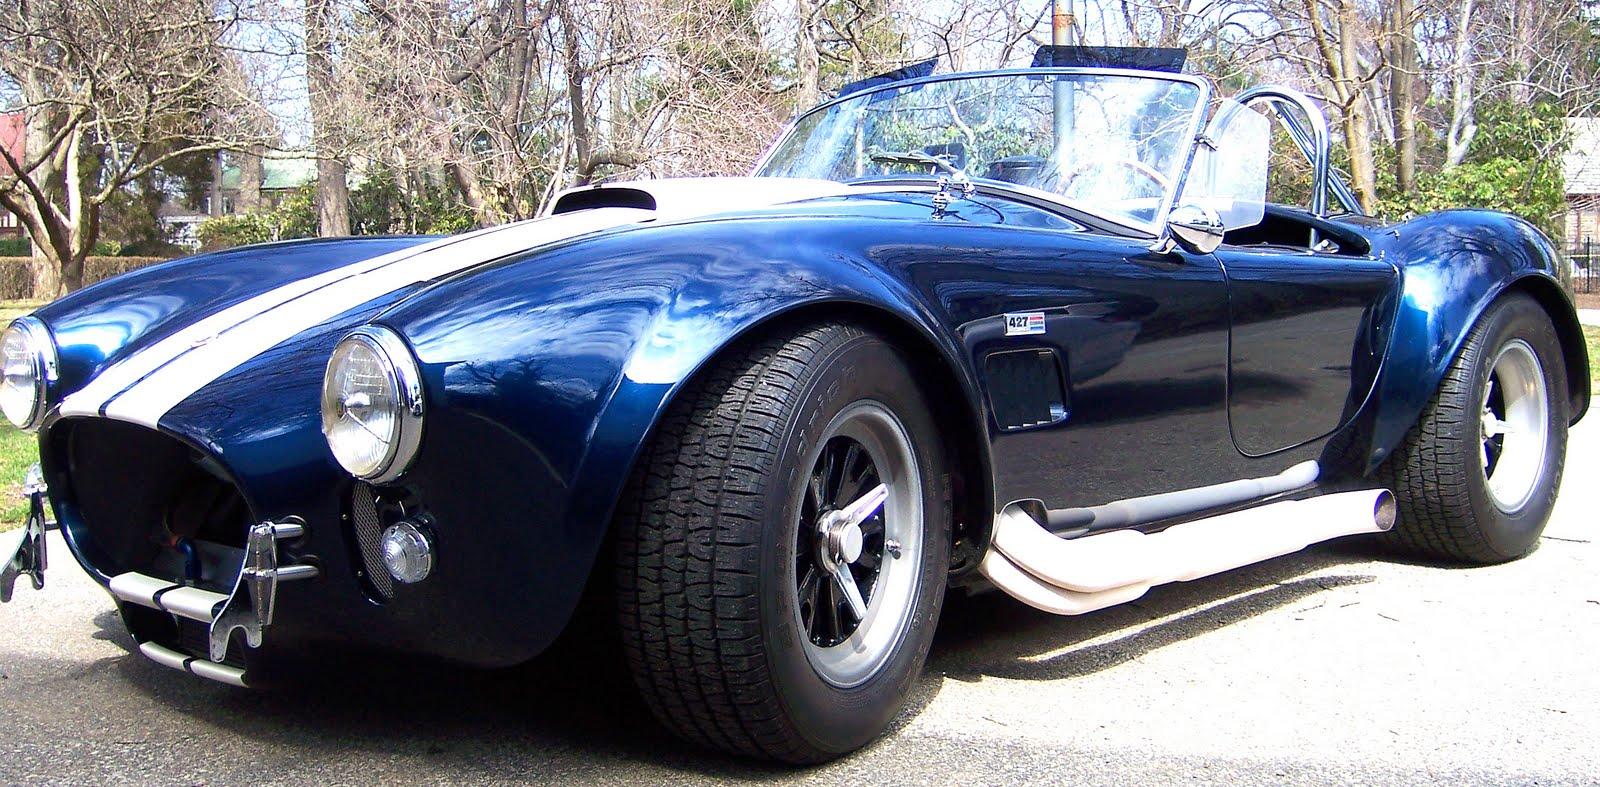 racing cigalo ac shelby cobra 427. Black Bedroom Furniture Sets. Home Design Ideas